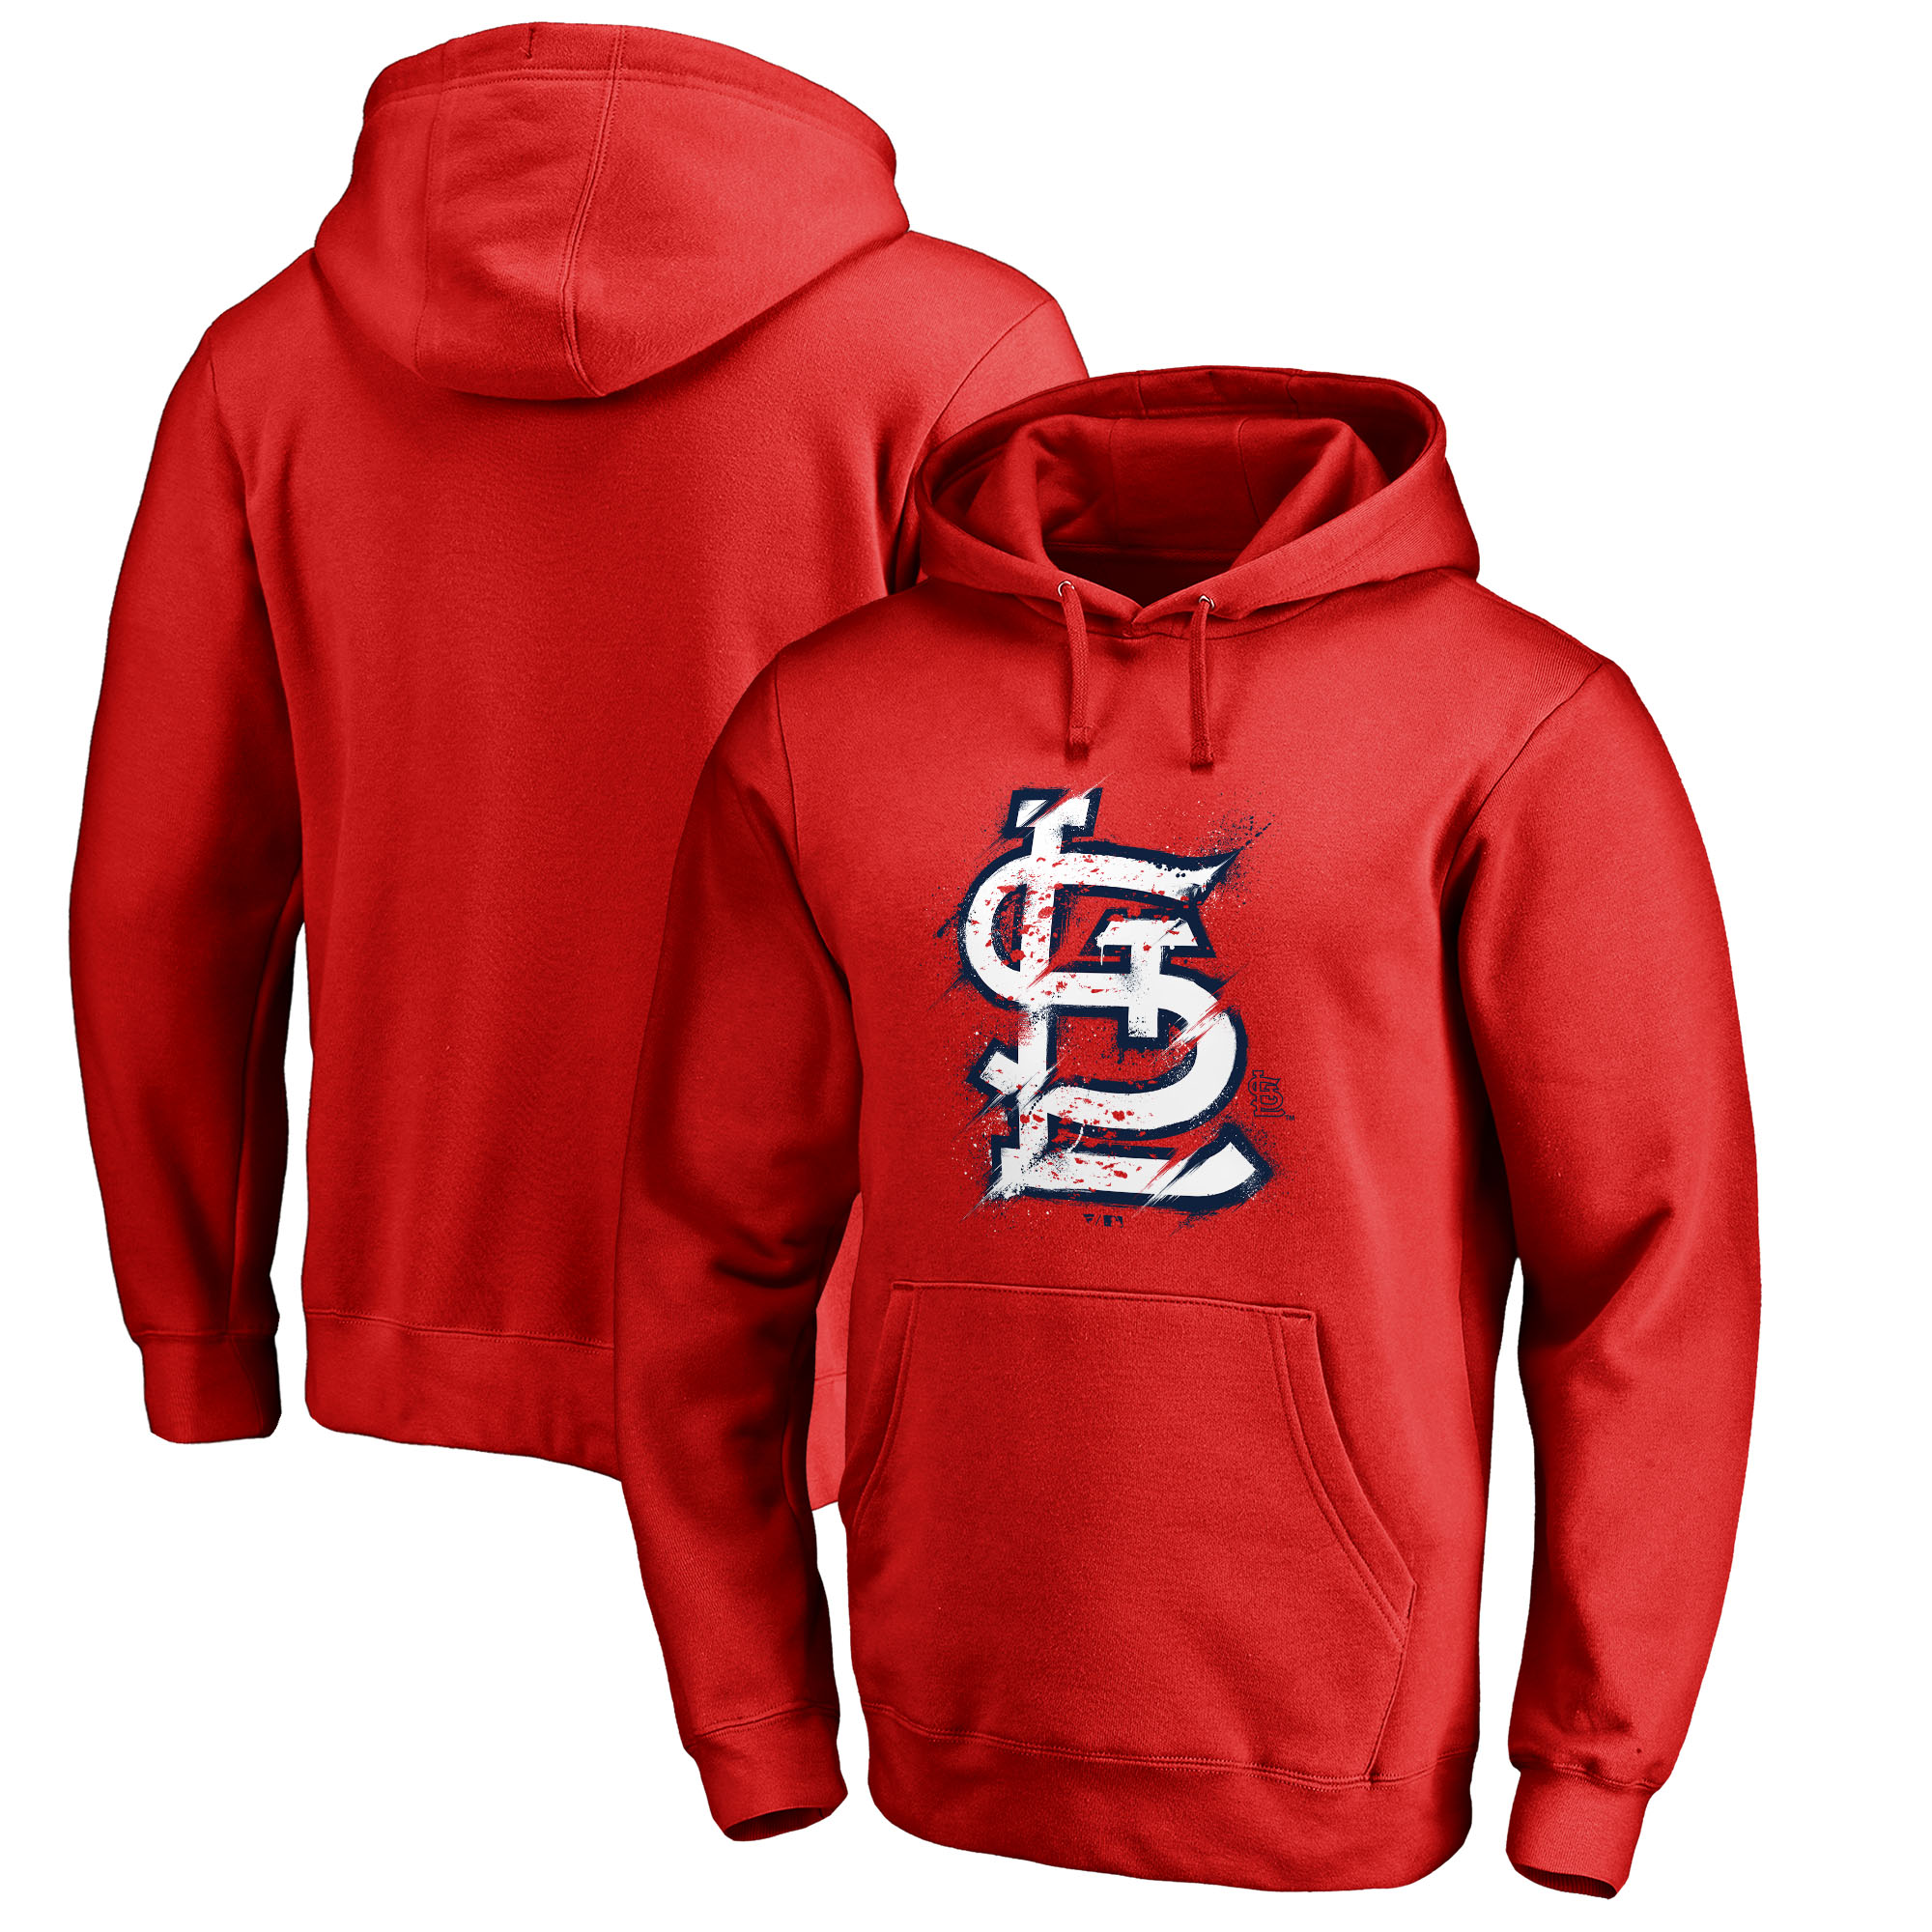 St. Louis Cardinals Fanatics Branded Splatter Logo Pullover Hoodie - Red